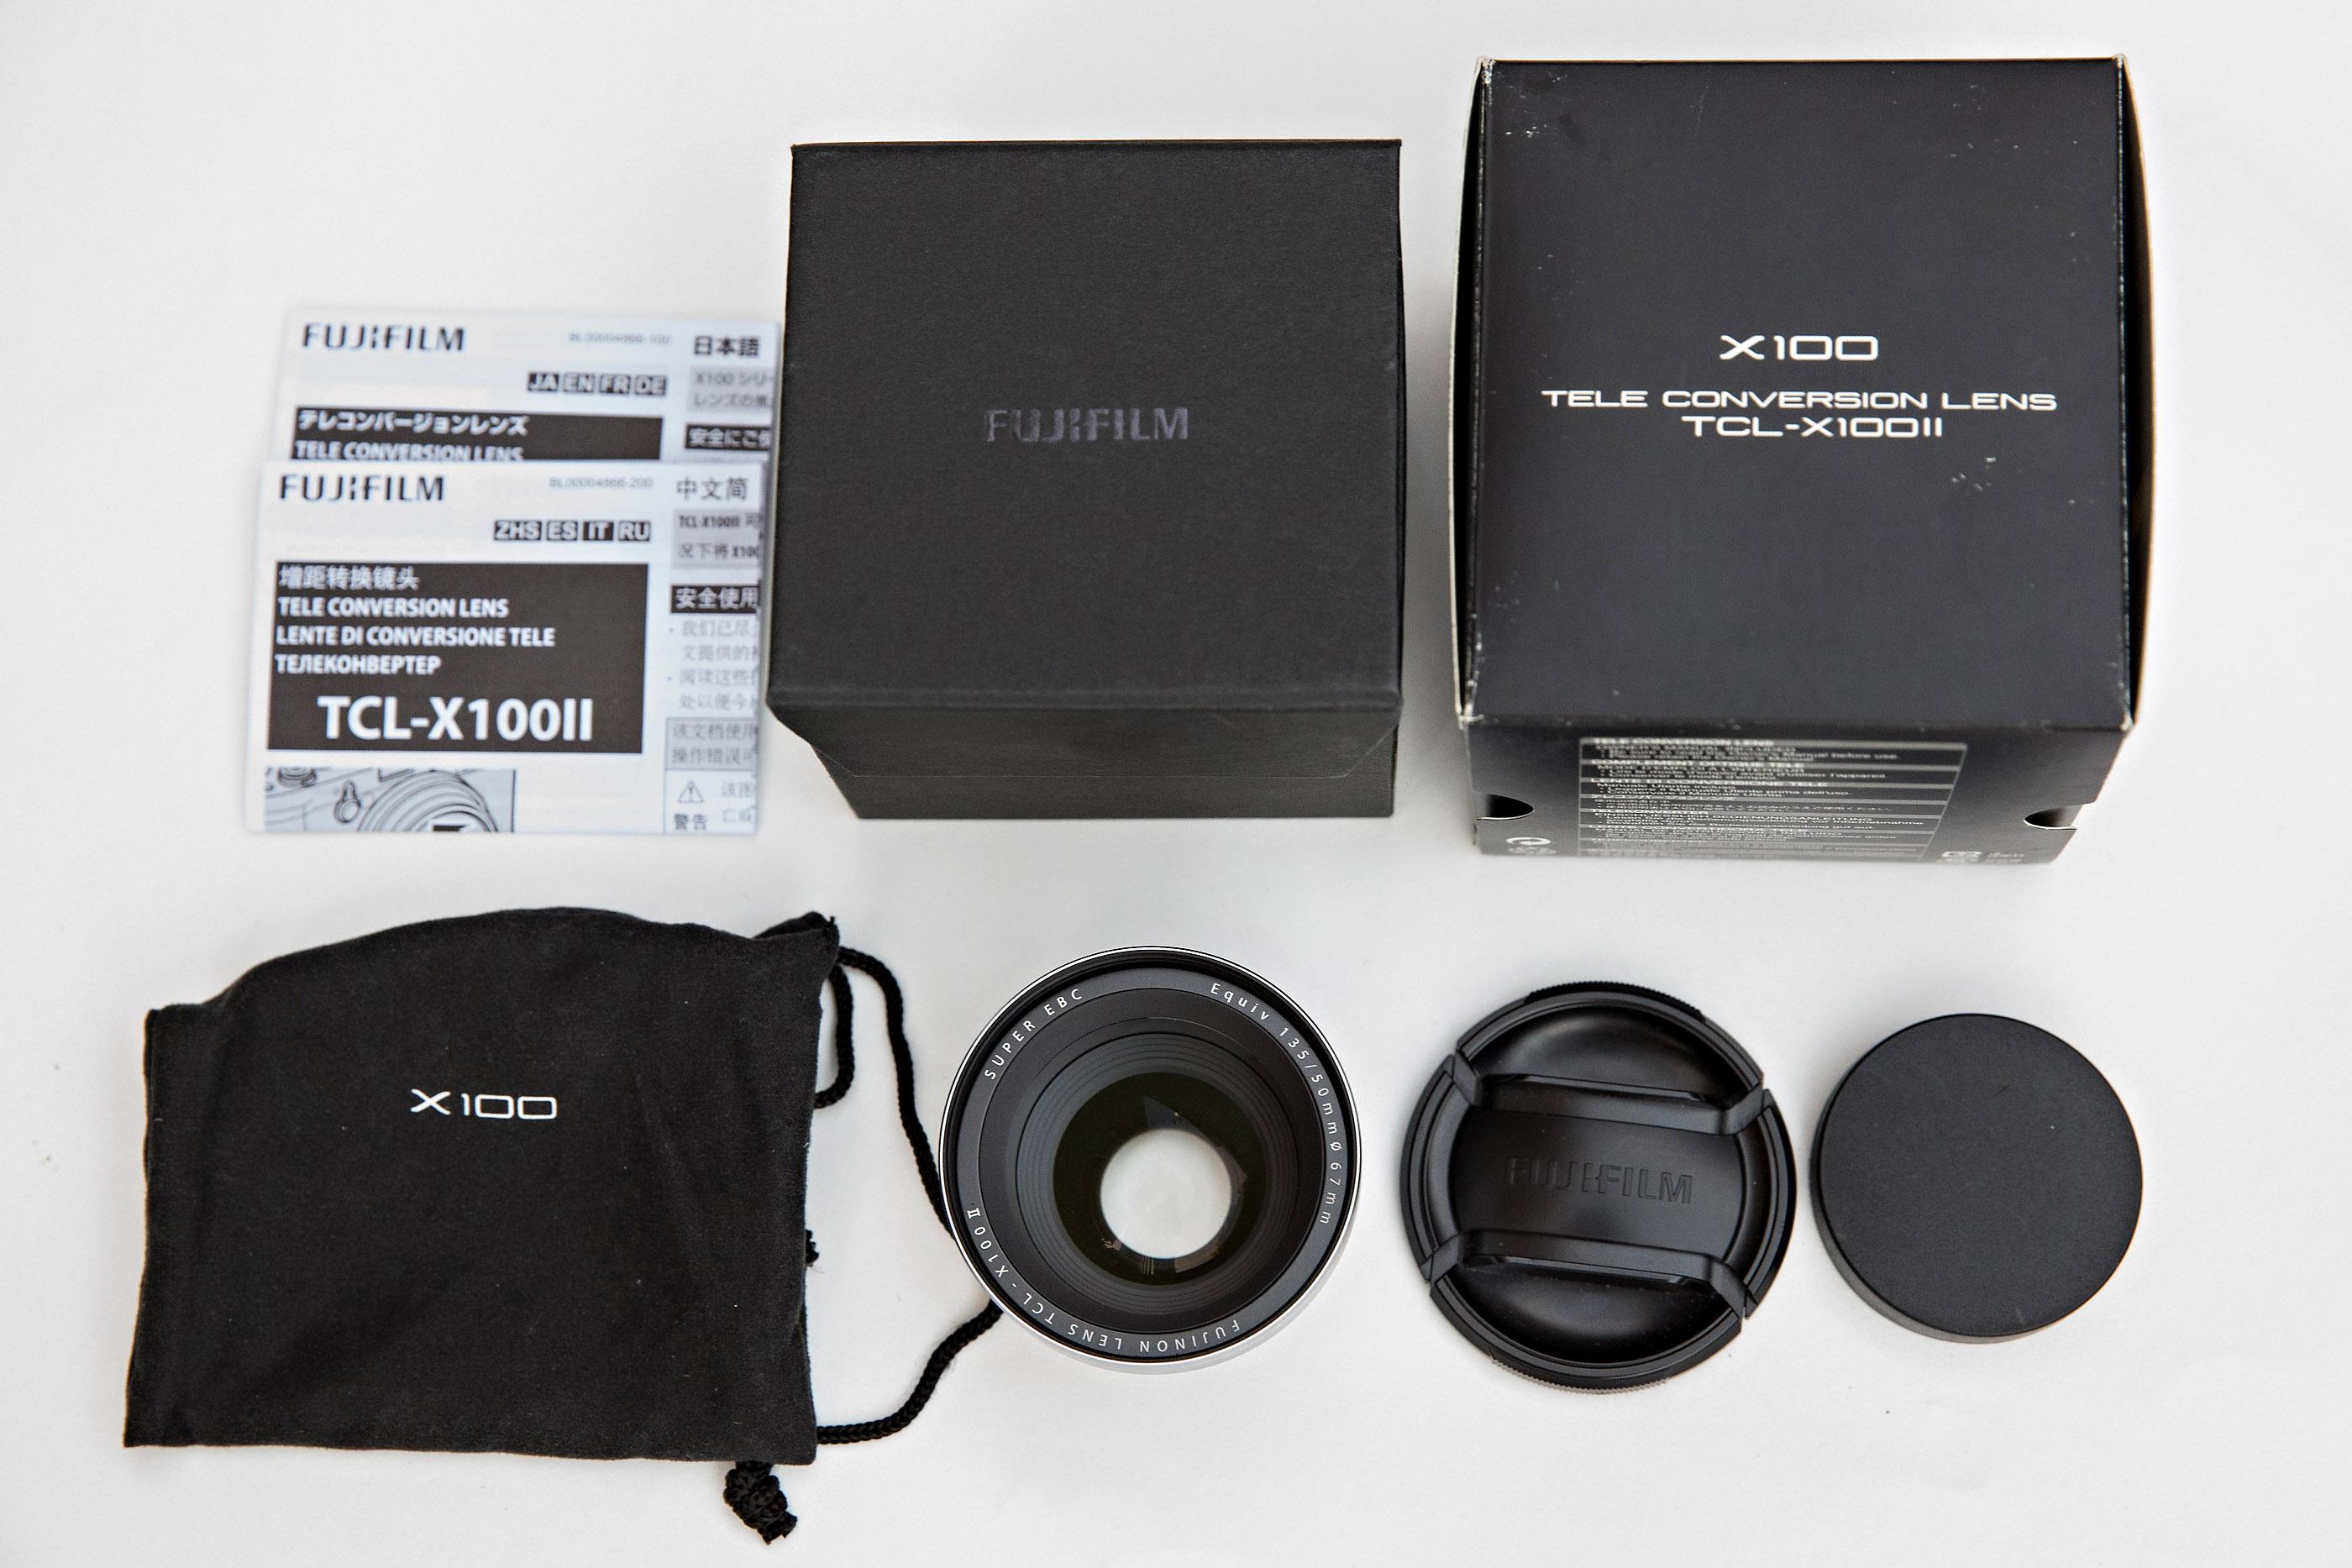 Sold: Fujifilm TCL-X100 II Tele Conv  Lens: $200 - FM Forums